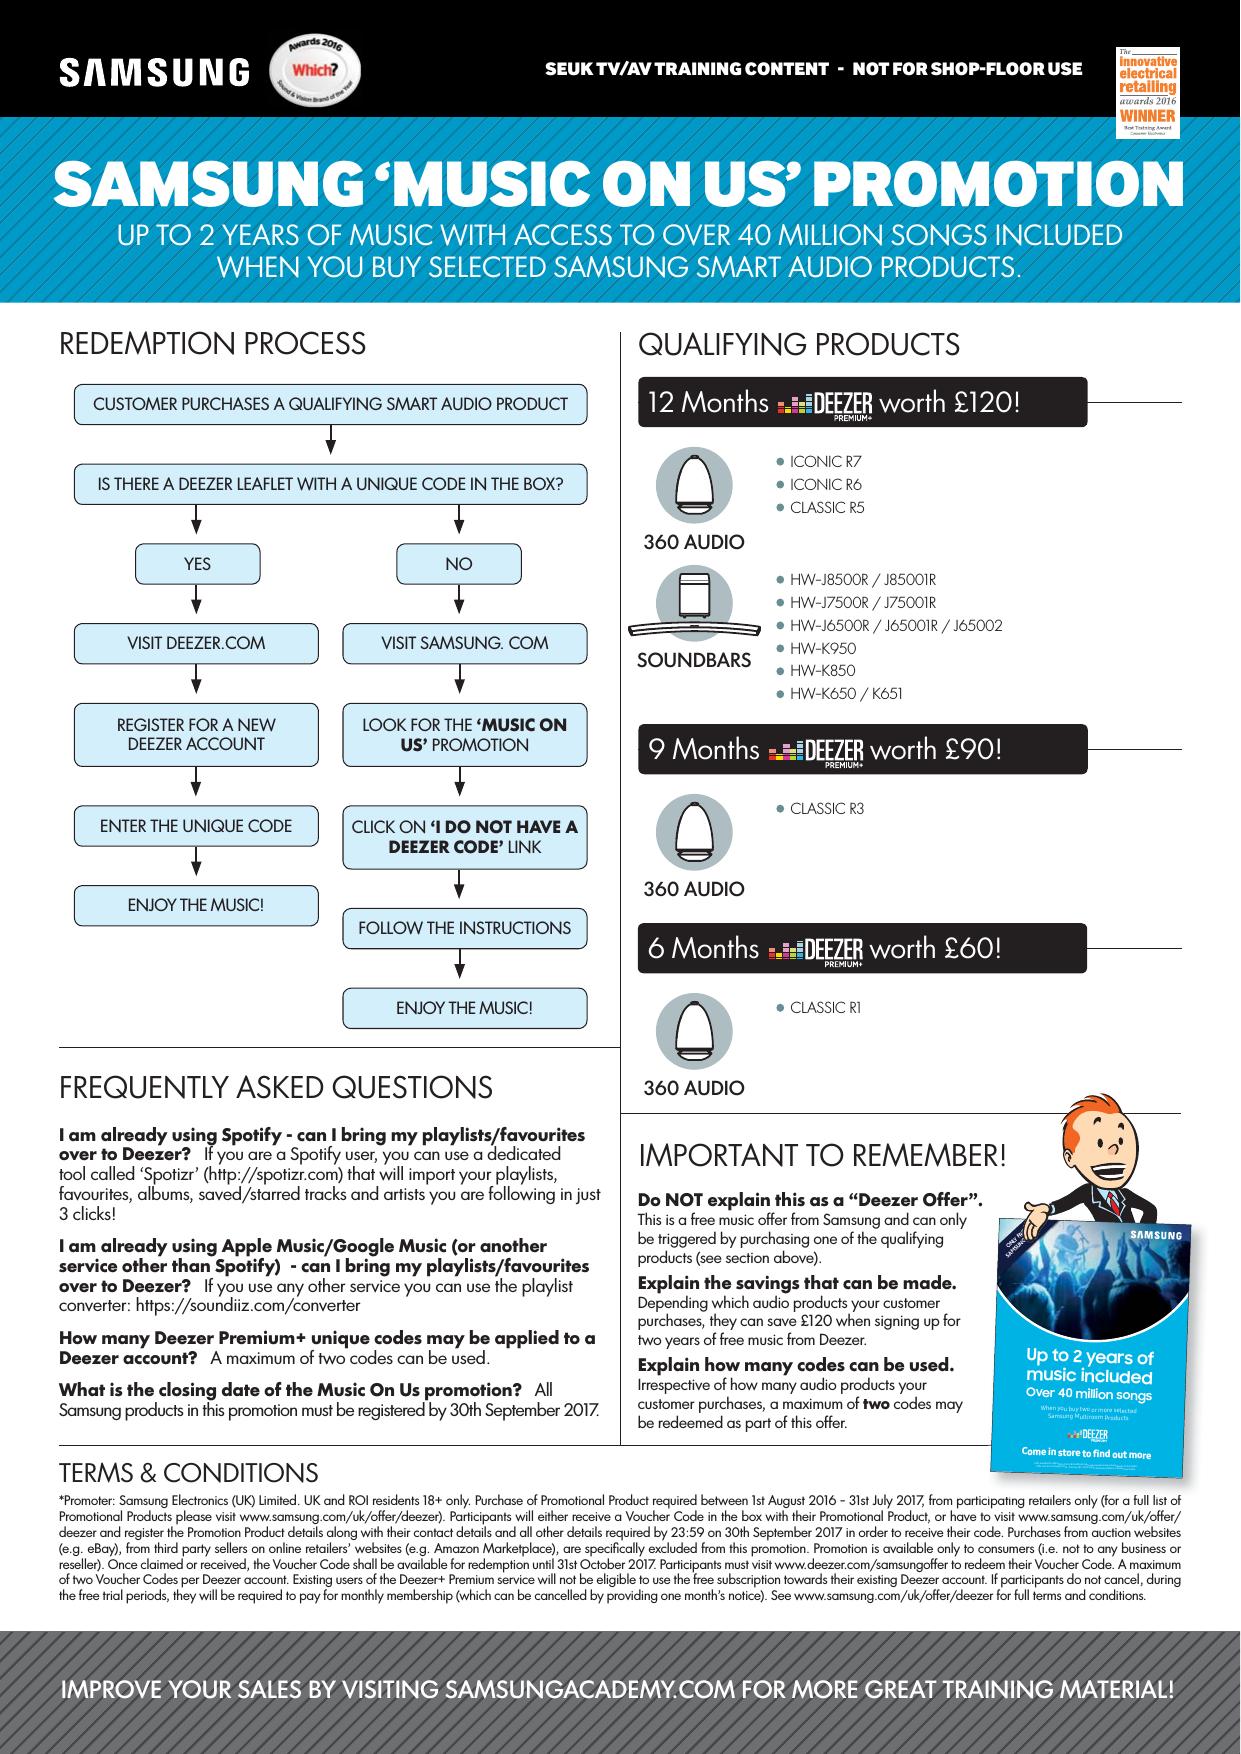 Samhwk950 K950_SB_ProductSheet_TVAVTraining_Aug2016 User Manual